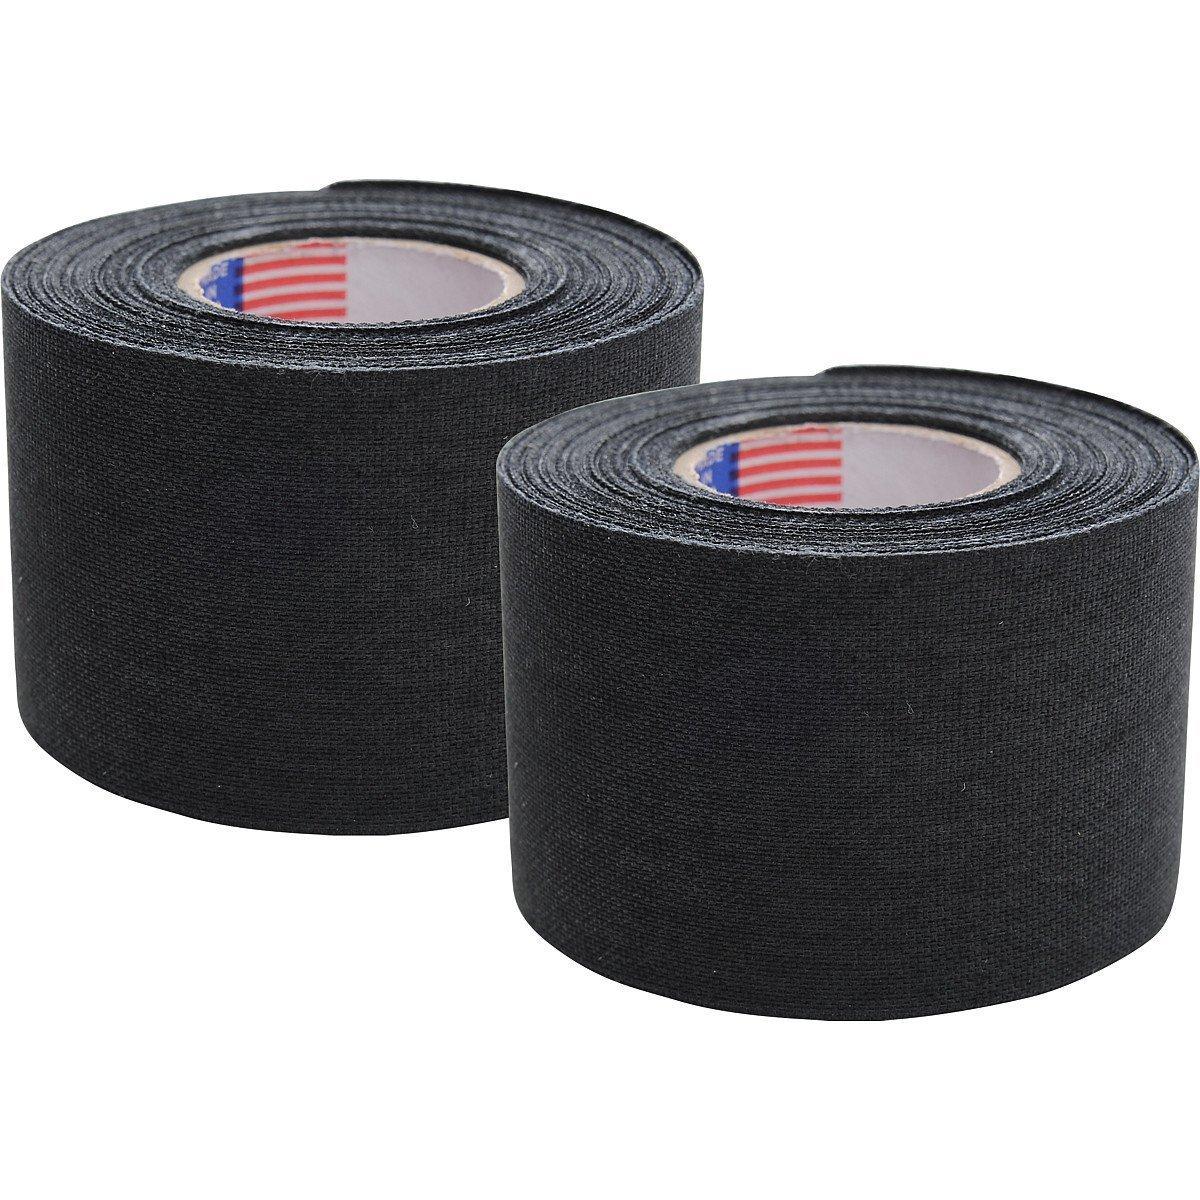 McDavid indiv. tape-black-shrink wrapped by McDavid